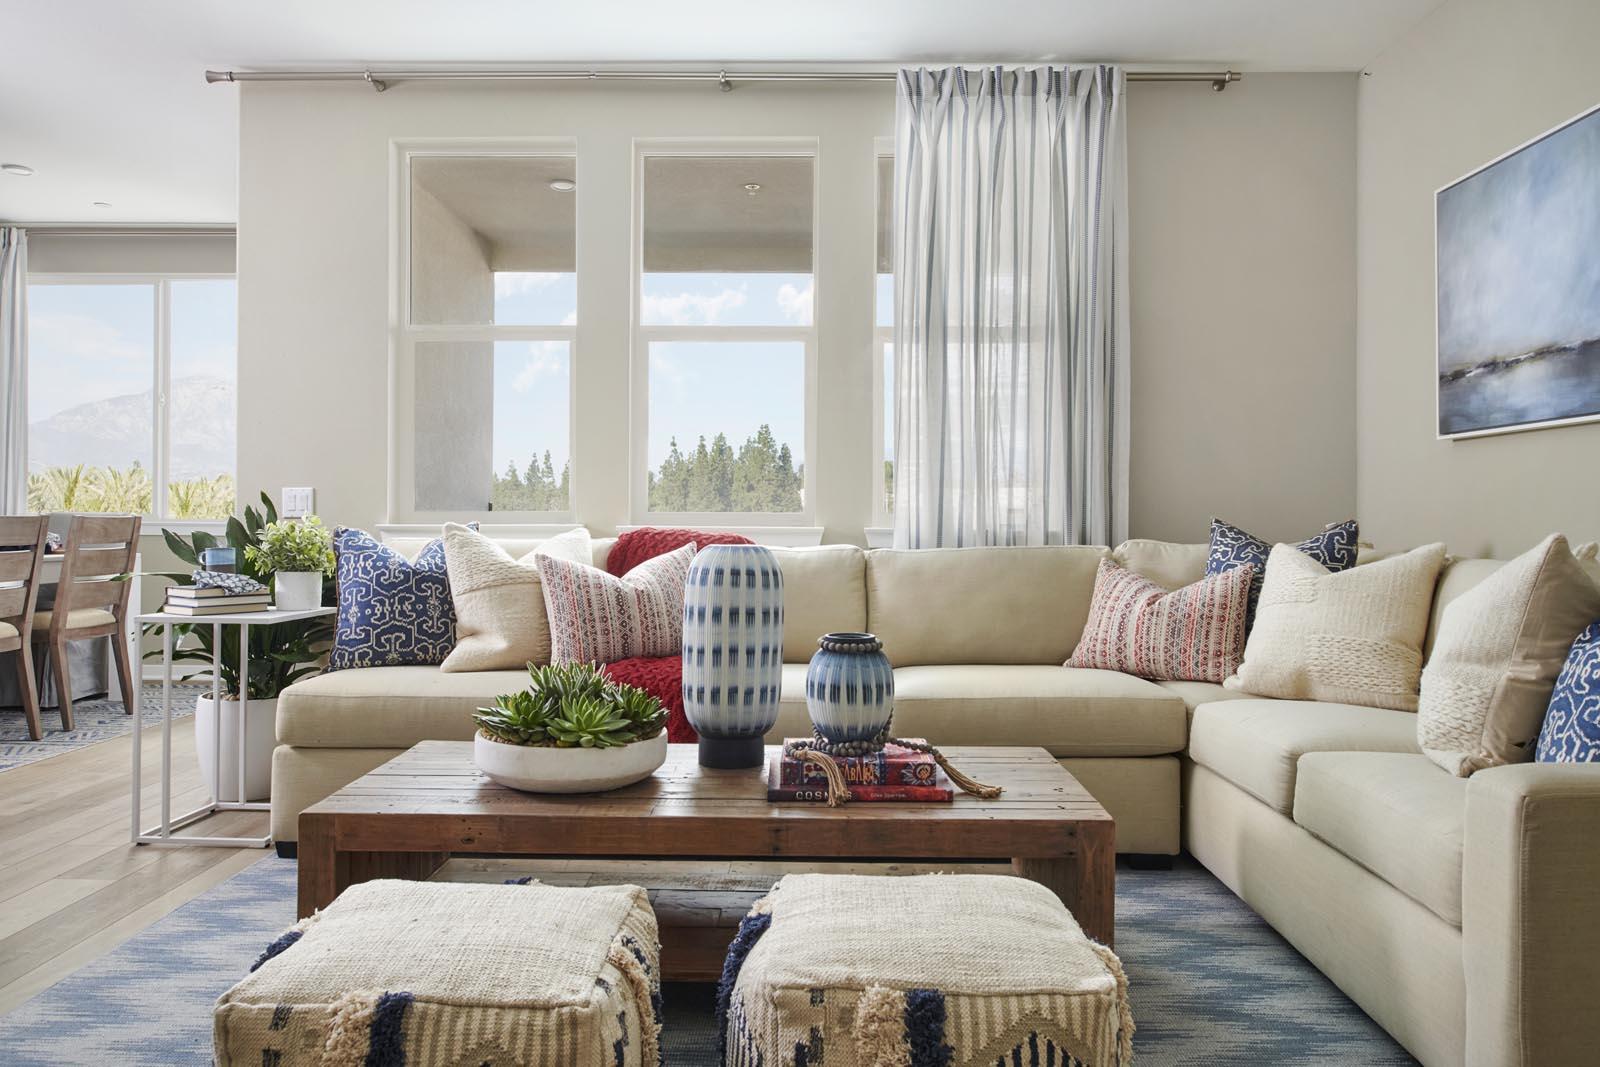 Great Room | Residence 4 | Aspire | New Homes in Rancho Cucamonga, CA | Van Daele Homes